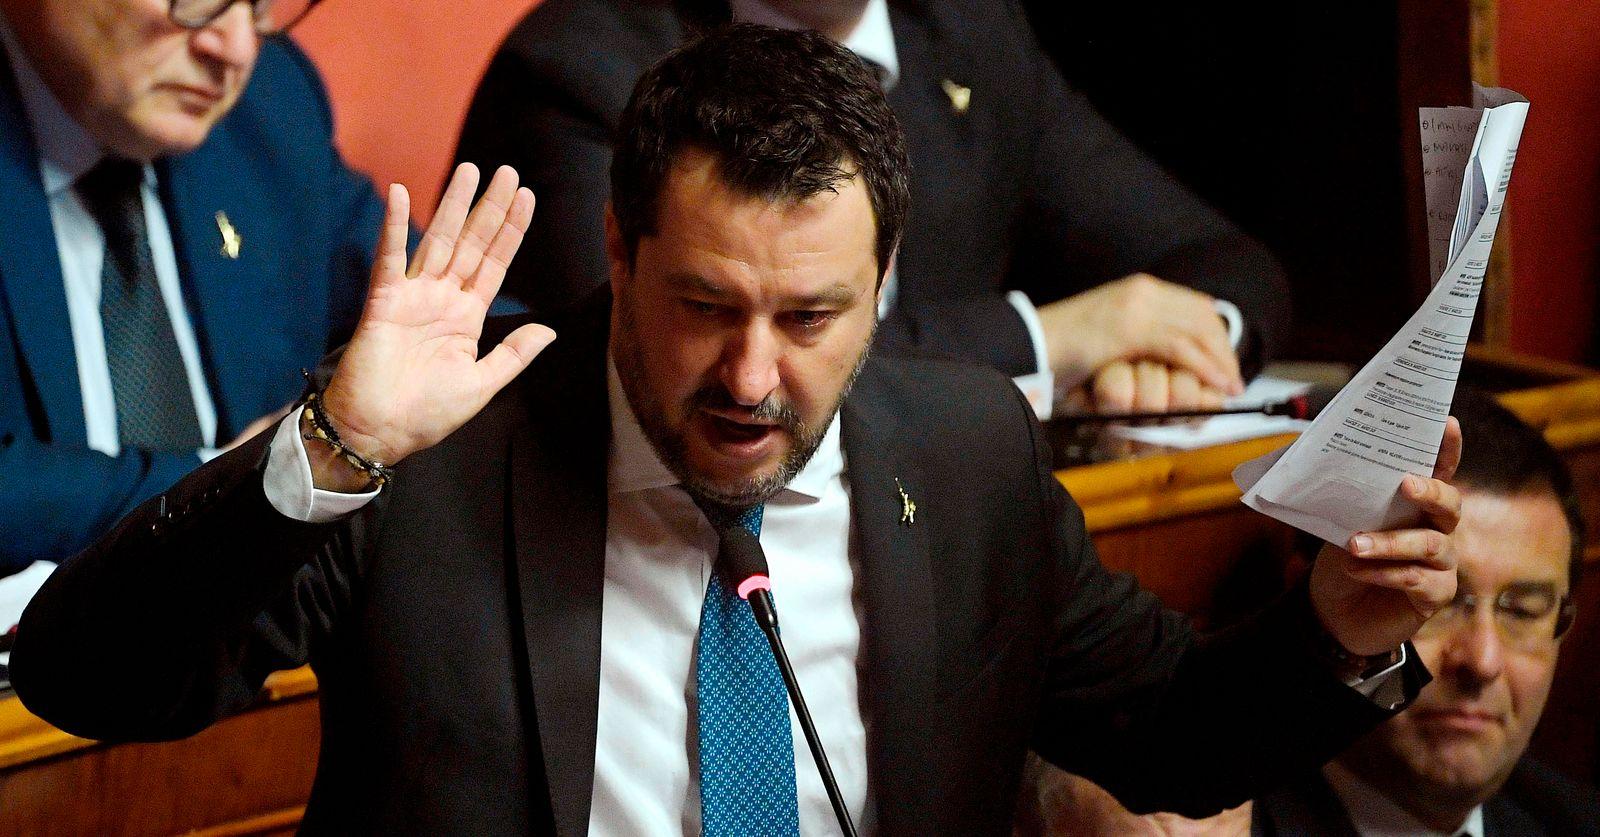 ITALY-POLITICS-MIGRANTS